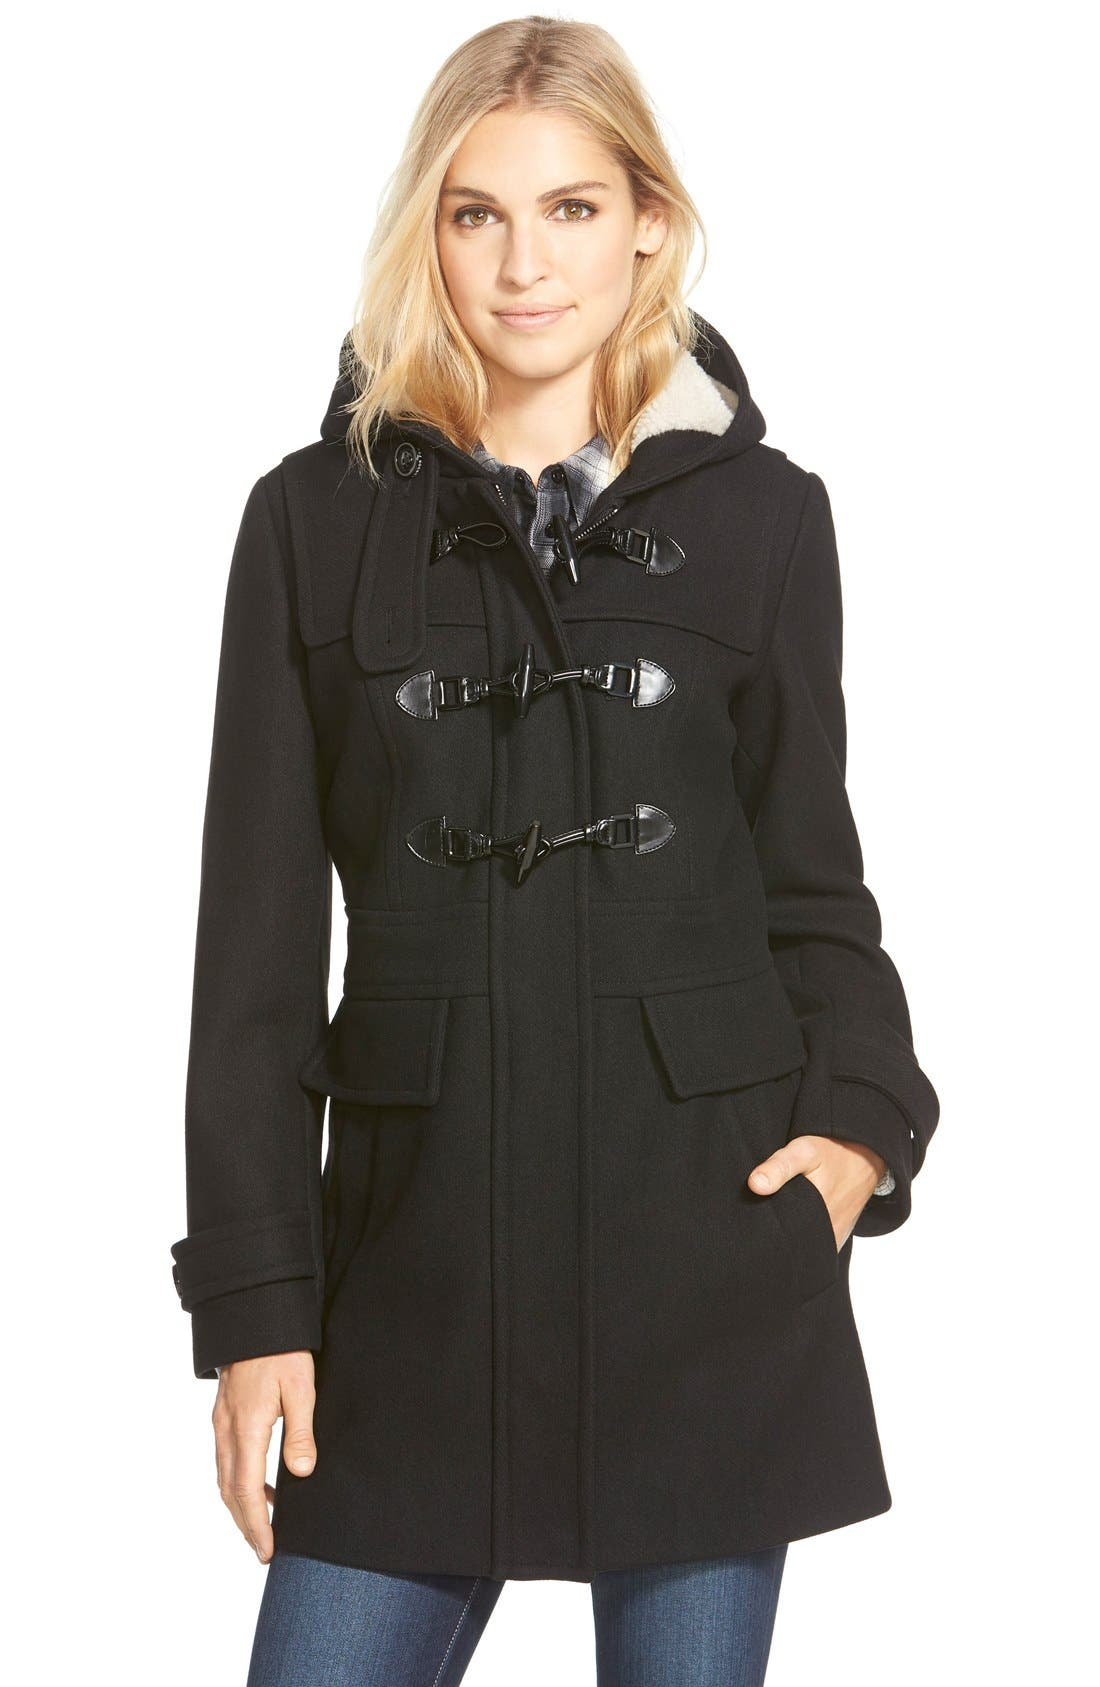 Main Image - London Fog Wool Blend Duffle Coat with Faux Shearling Lined Hood